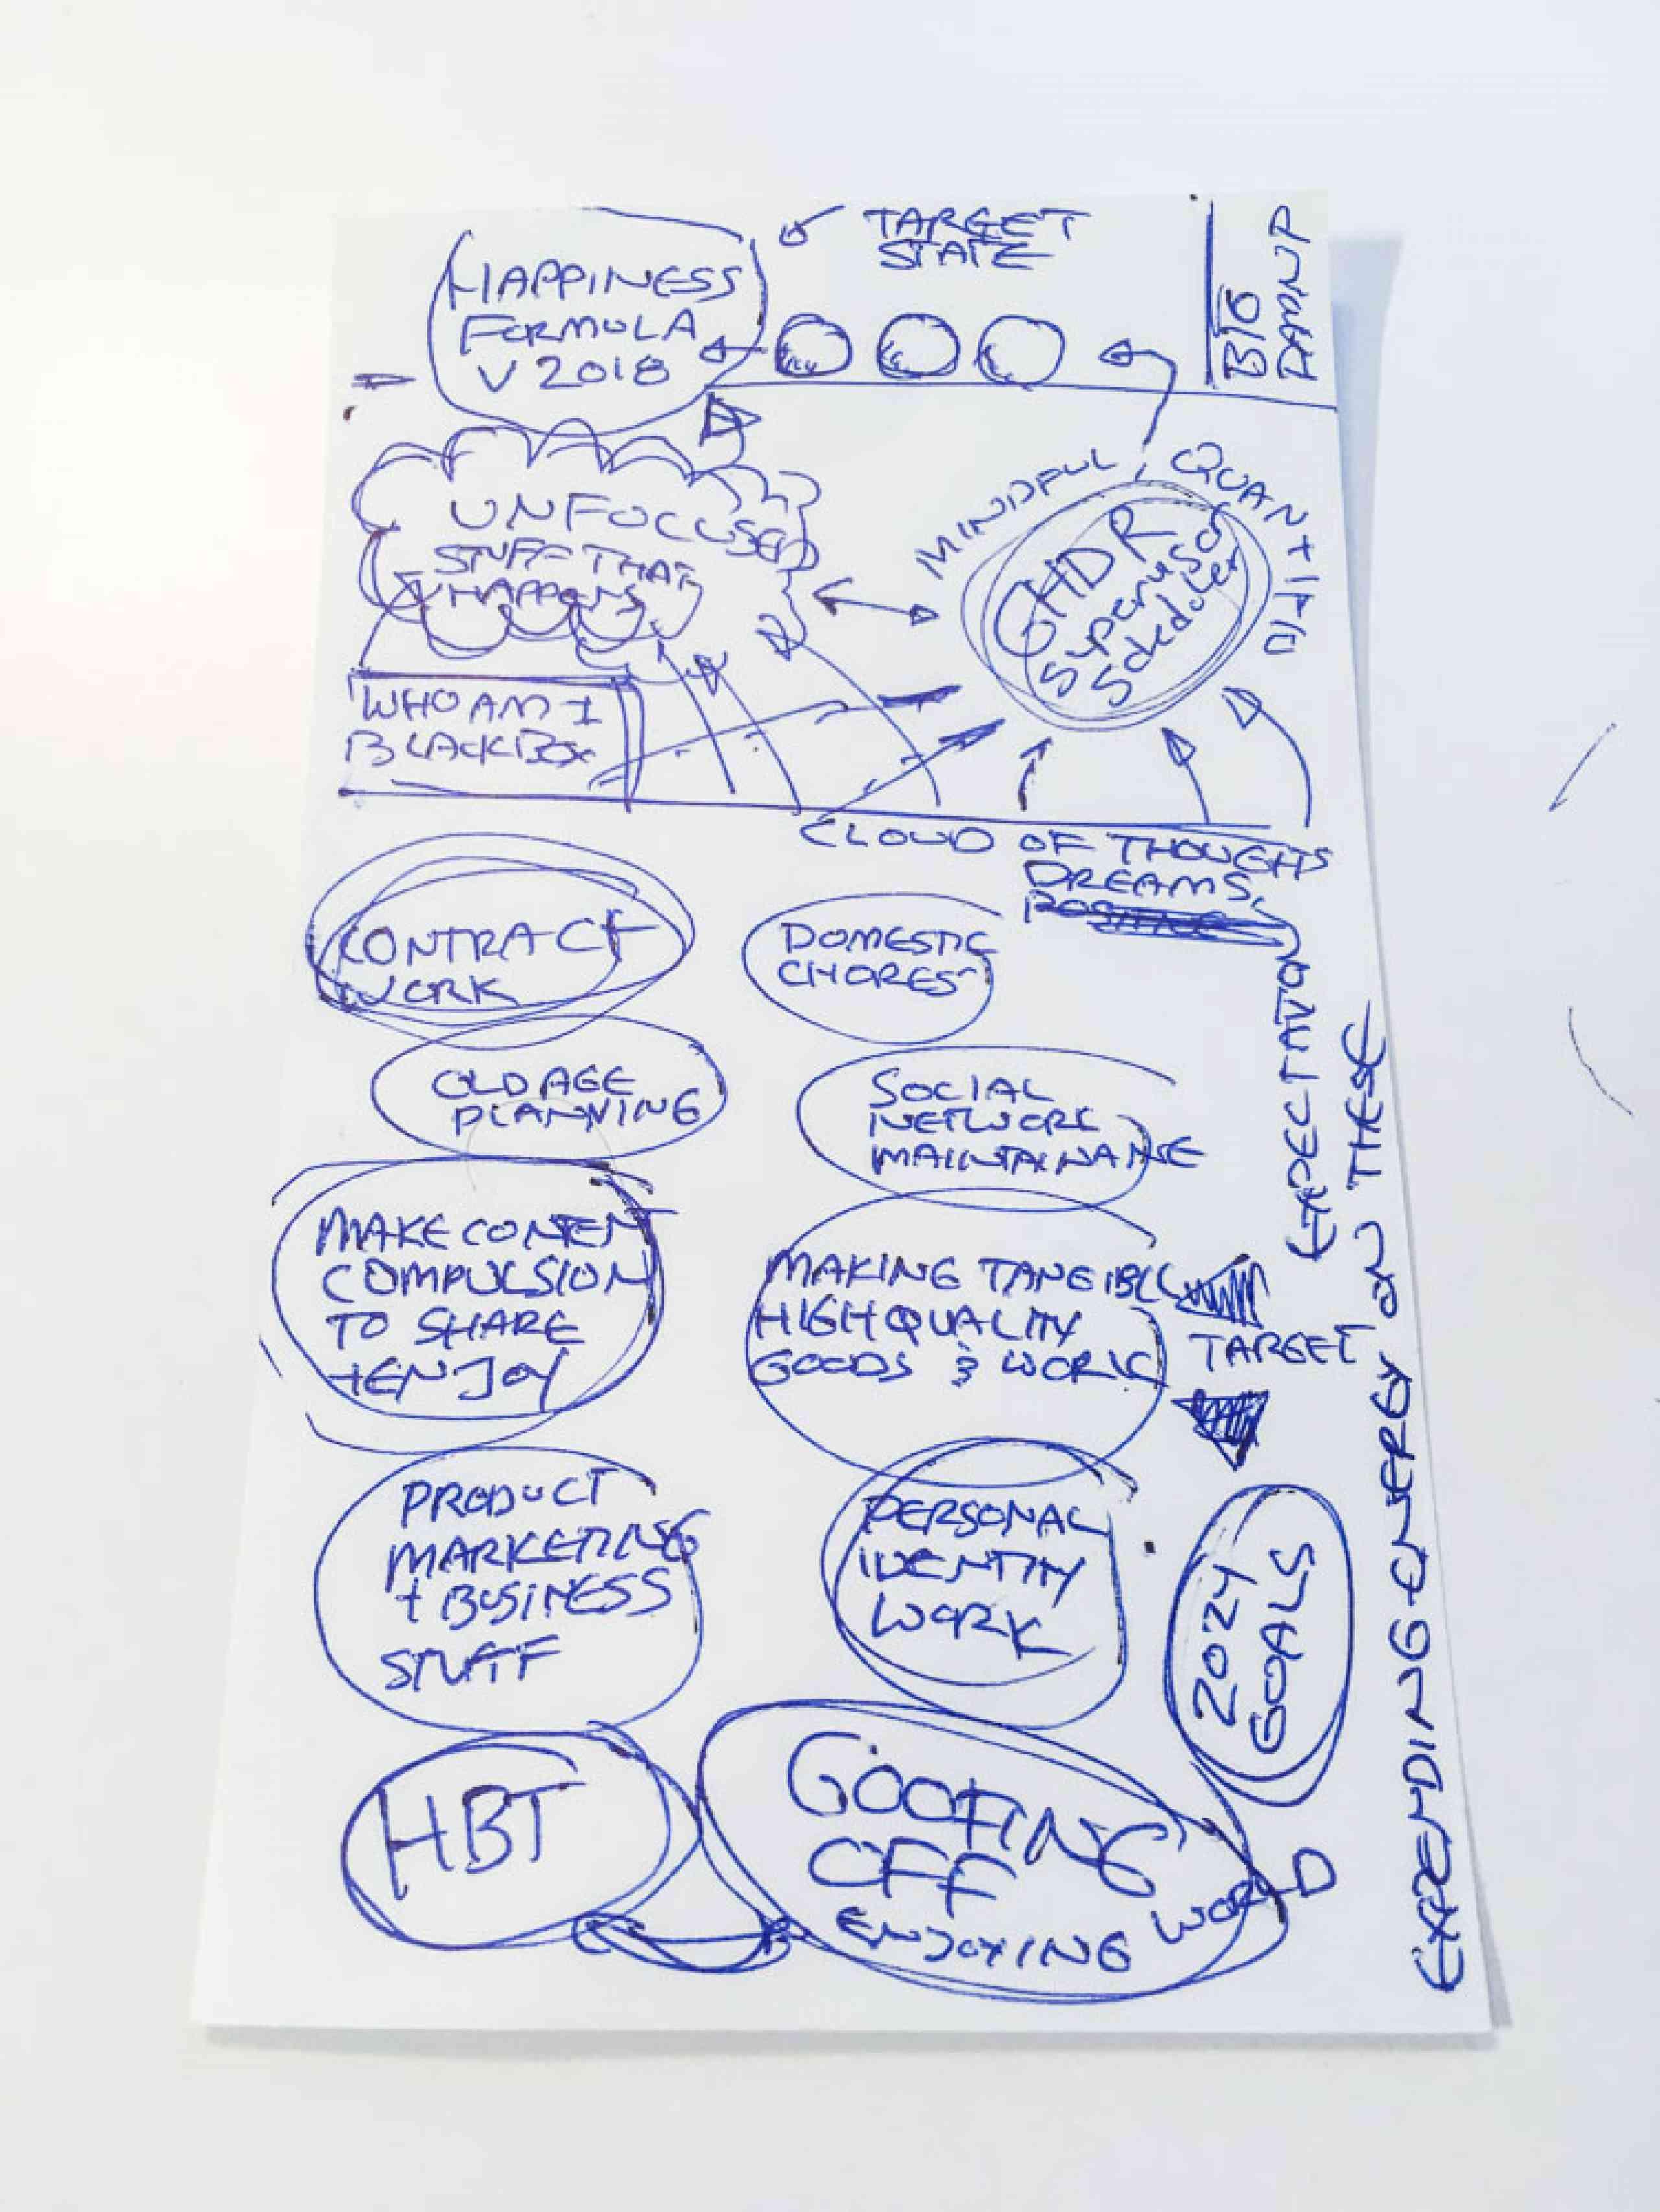 ProductivityModel